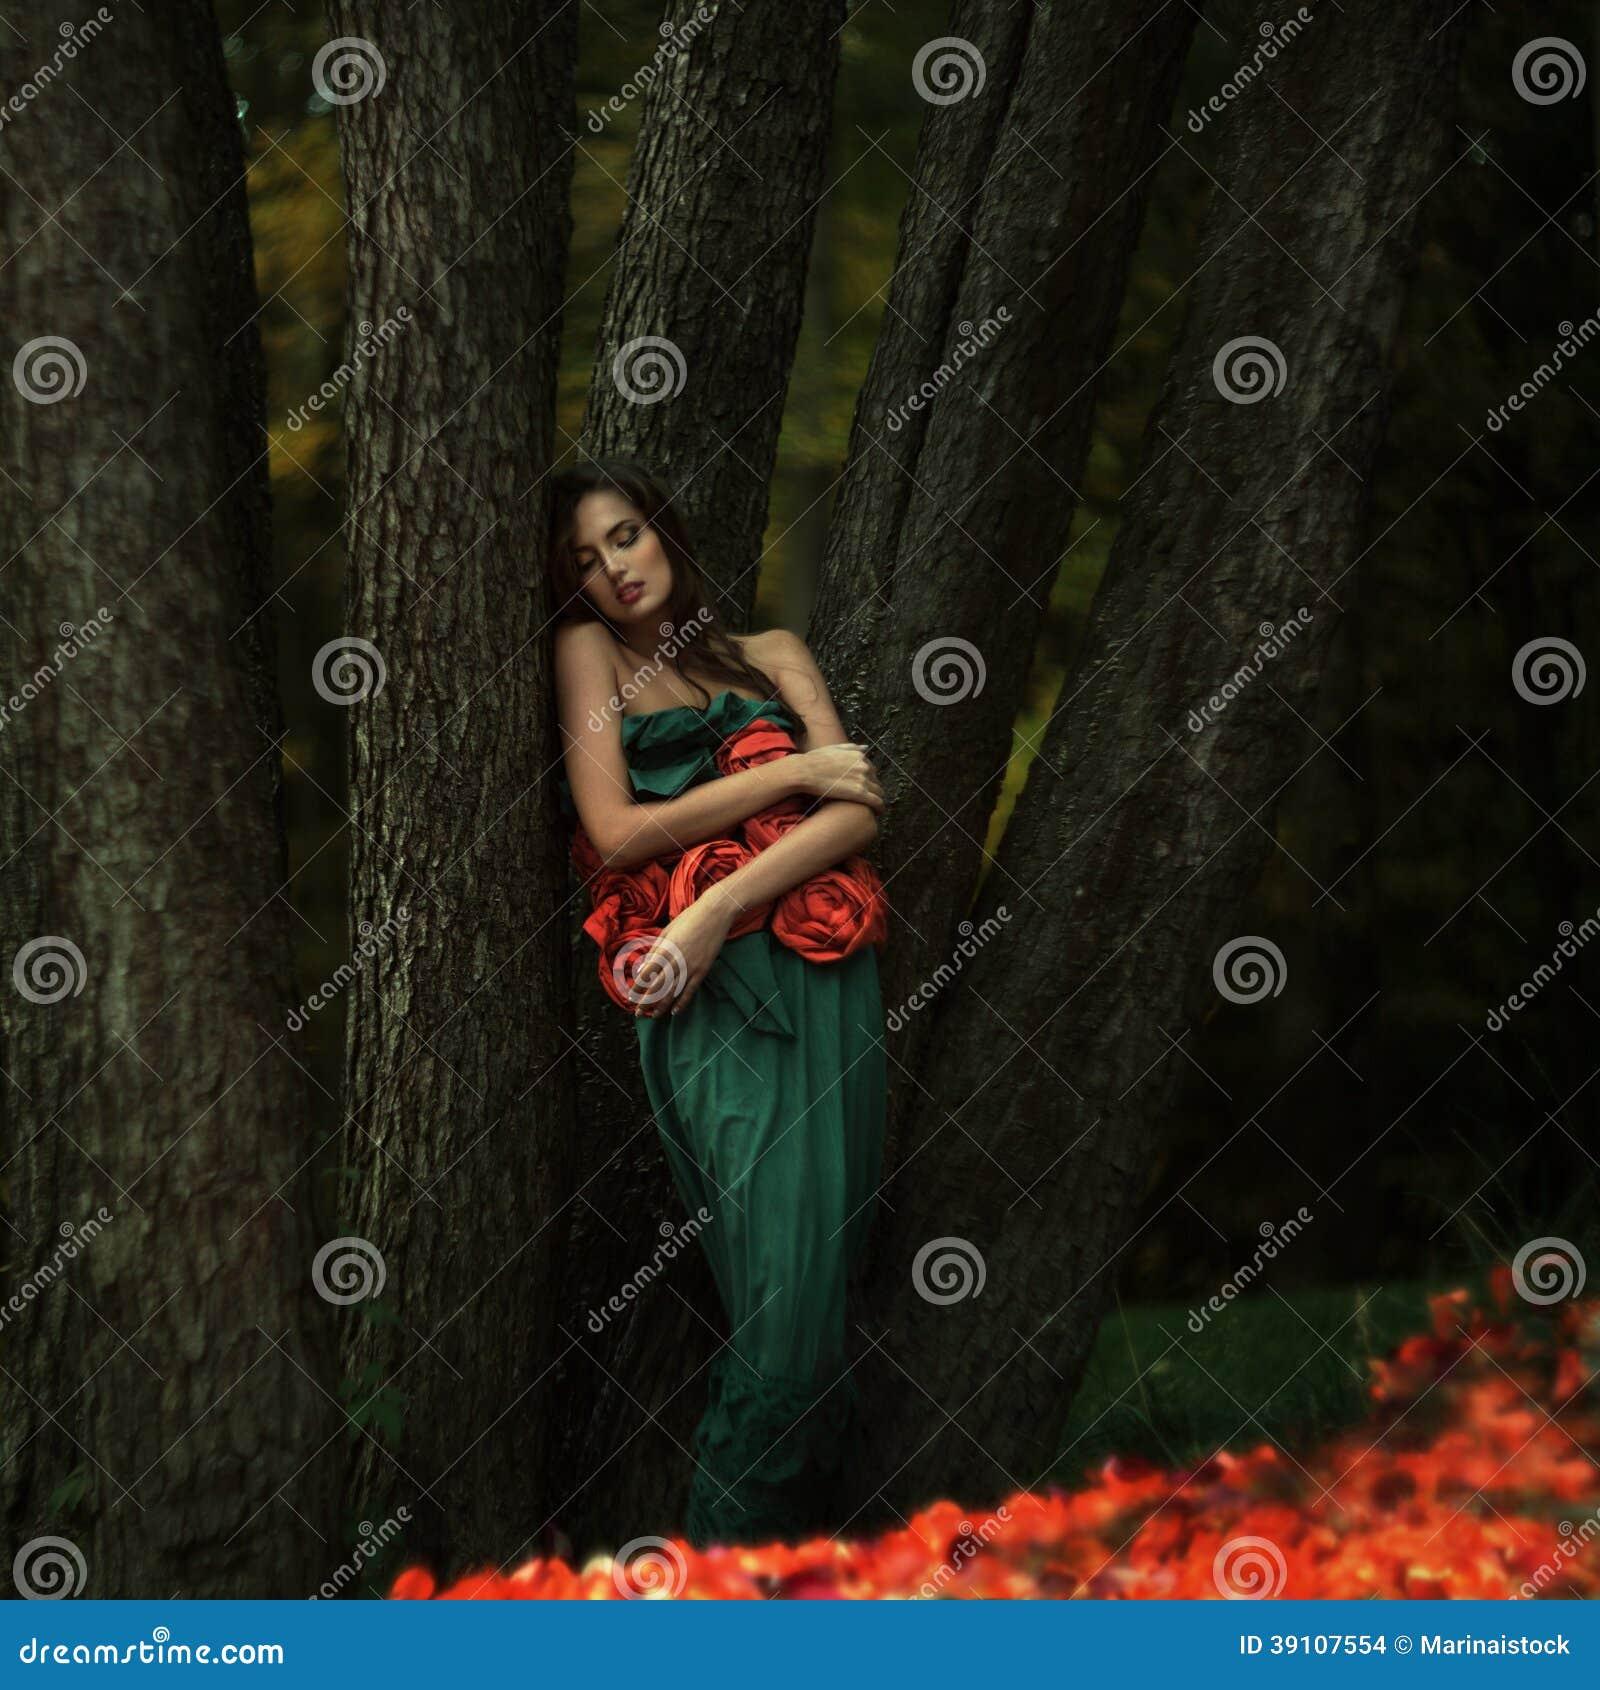 Mooi meisje in een geheimzinnige plaats.